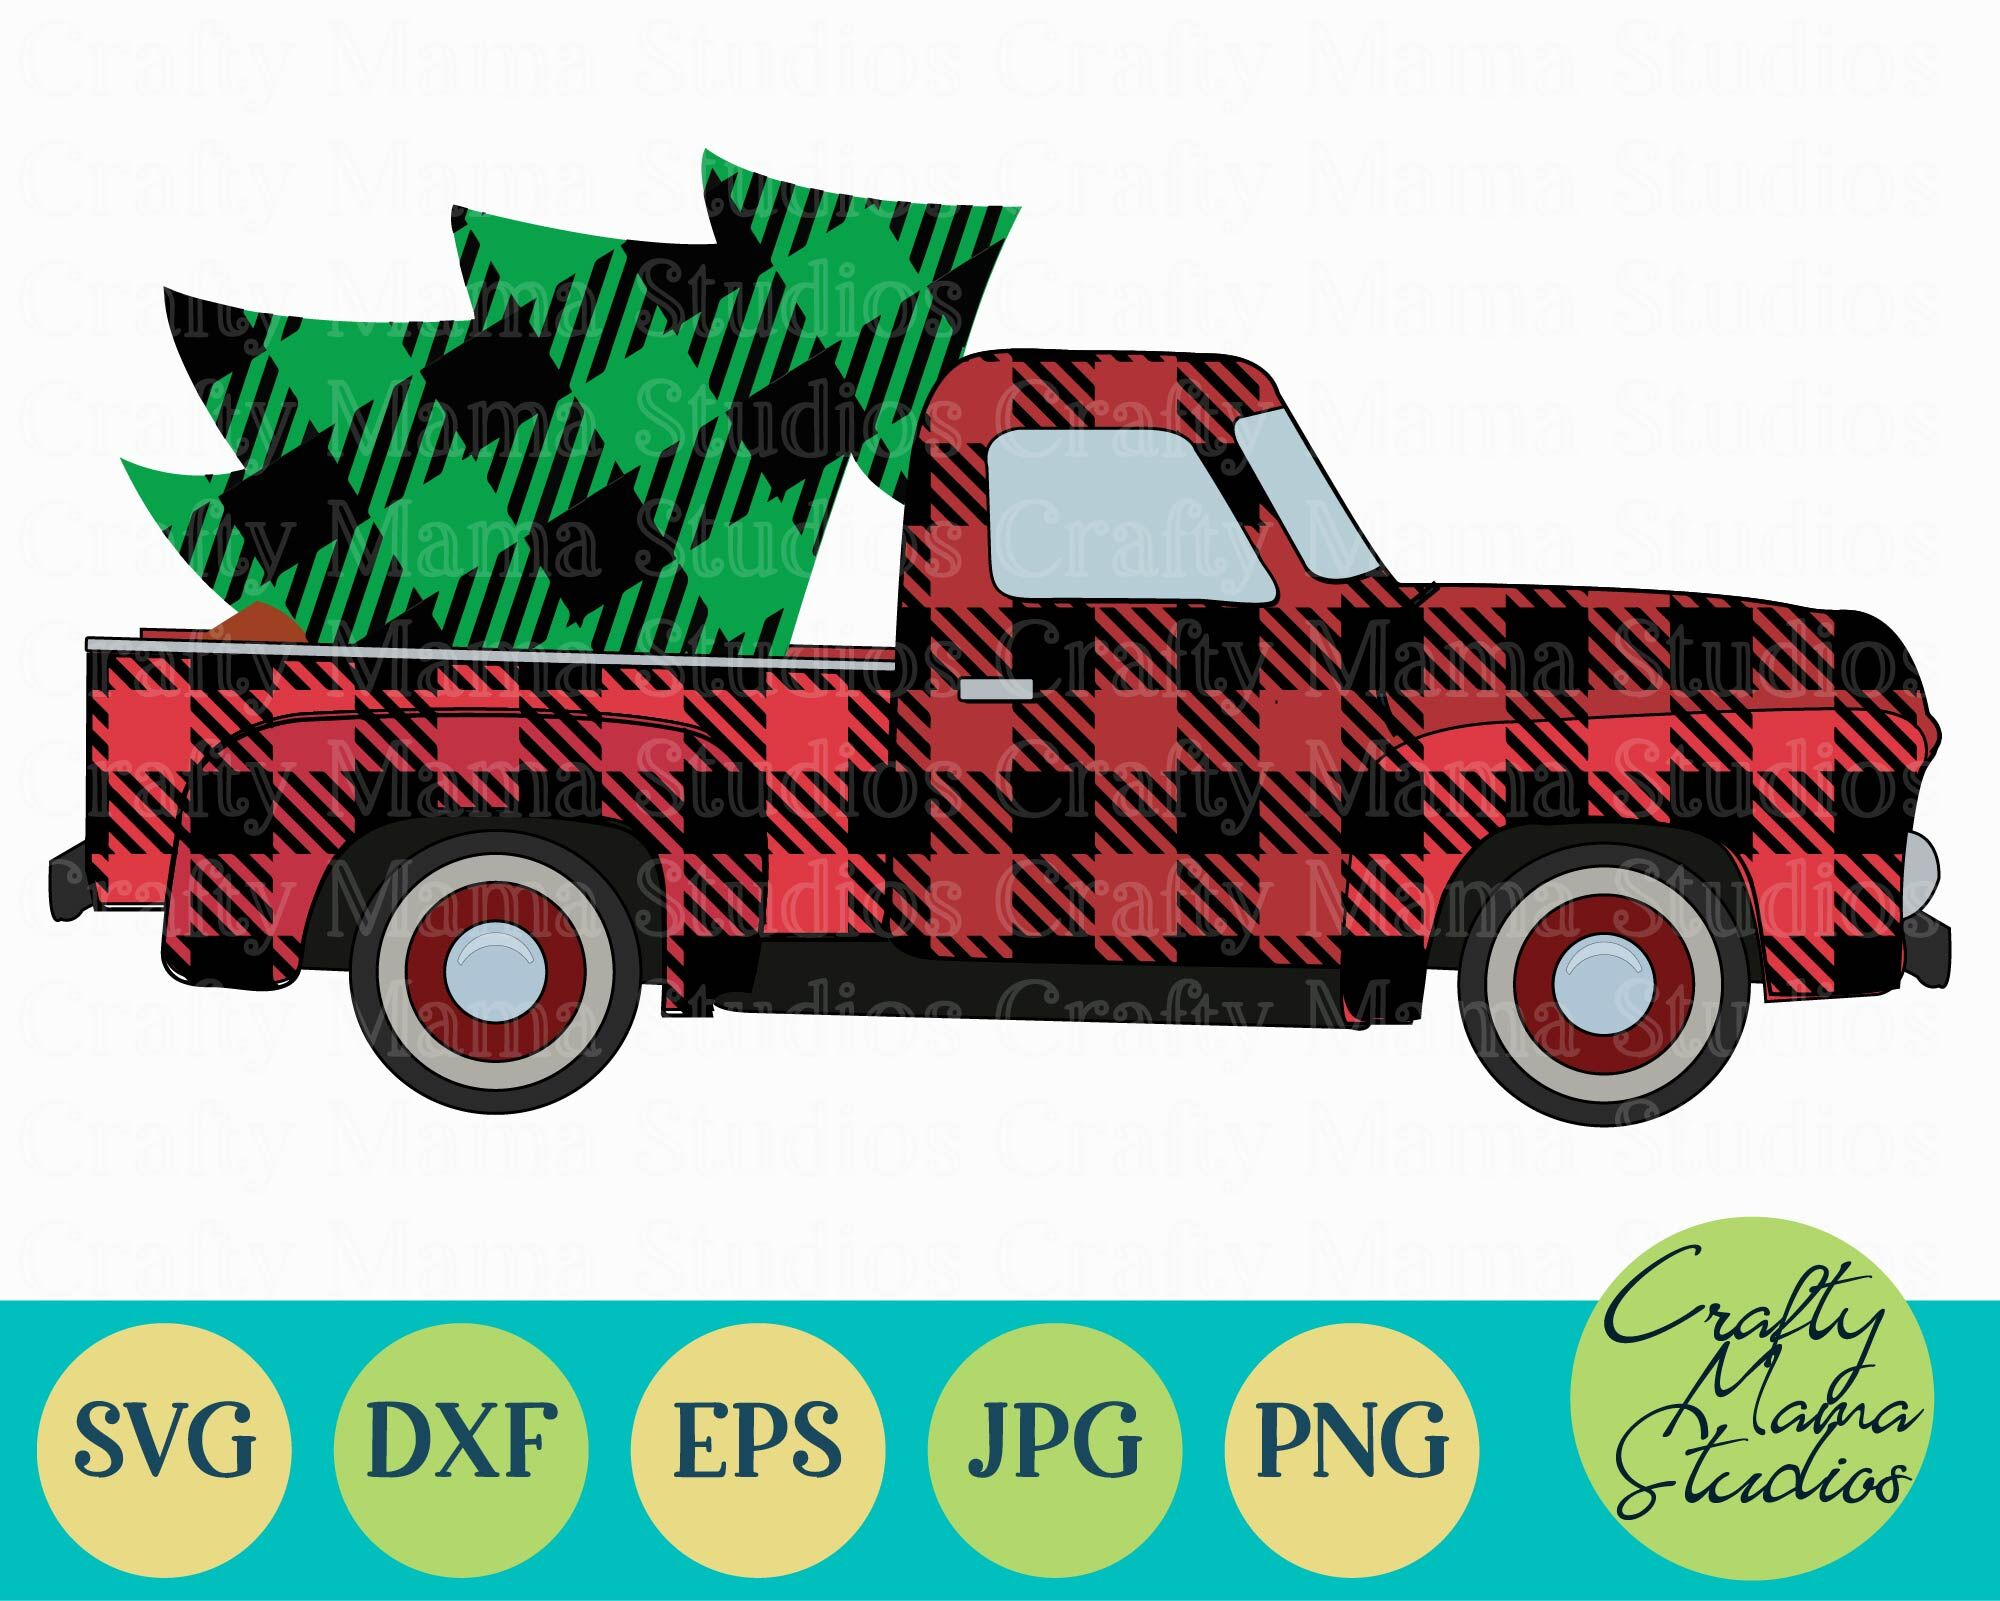 Download Free Vintage Christmas Truck Svg Svg File Download Free And Premium Svg Cut Images